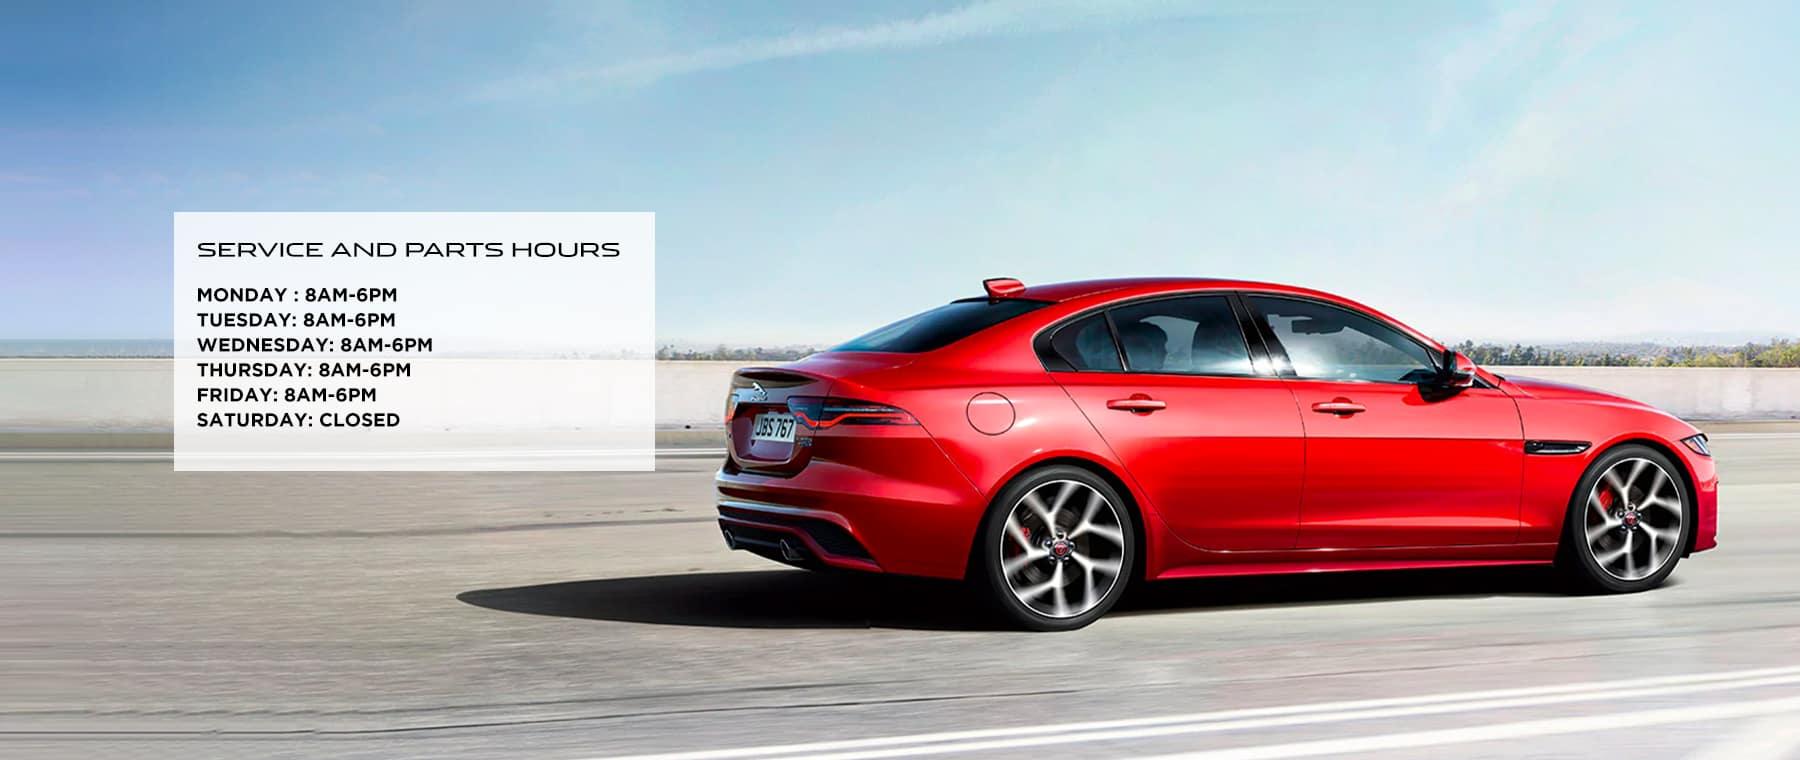 Enhanced Safety Protocols At Jaguar Main Line